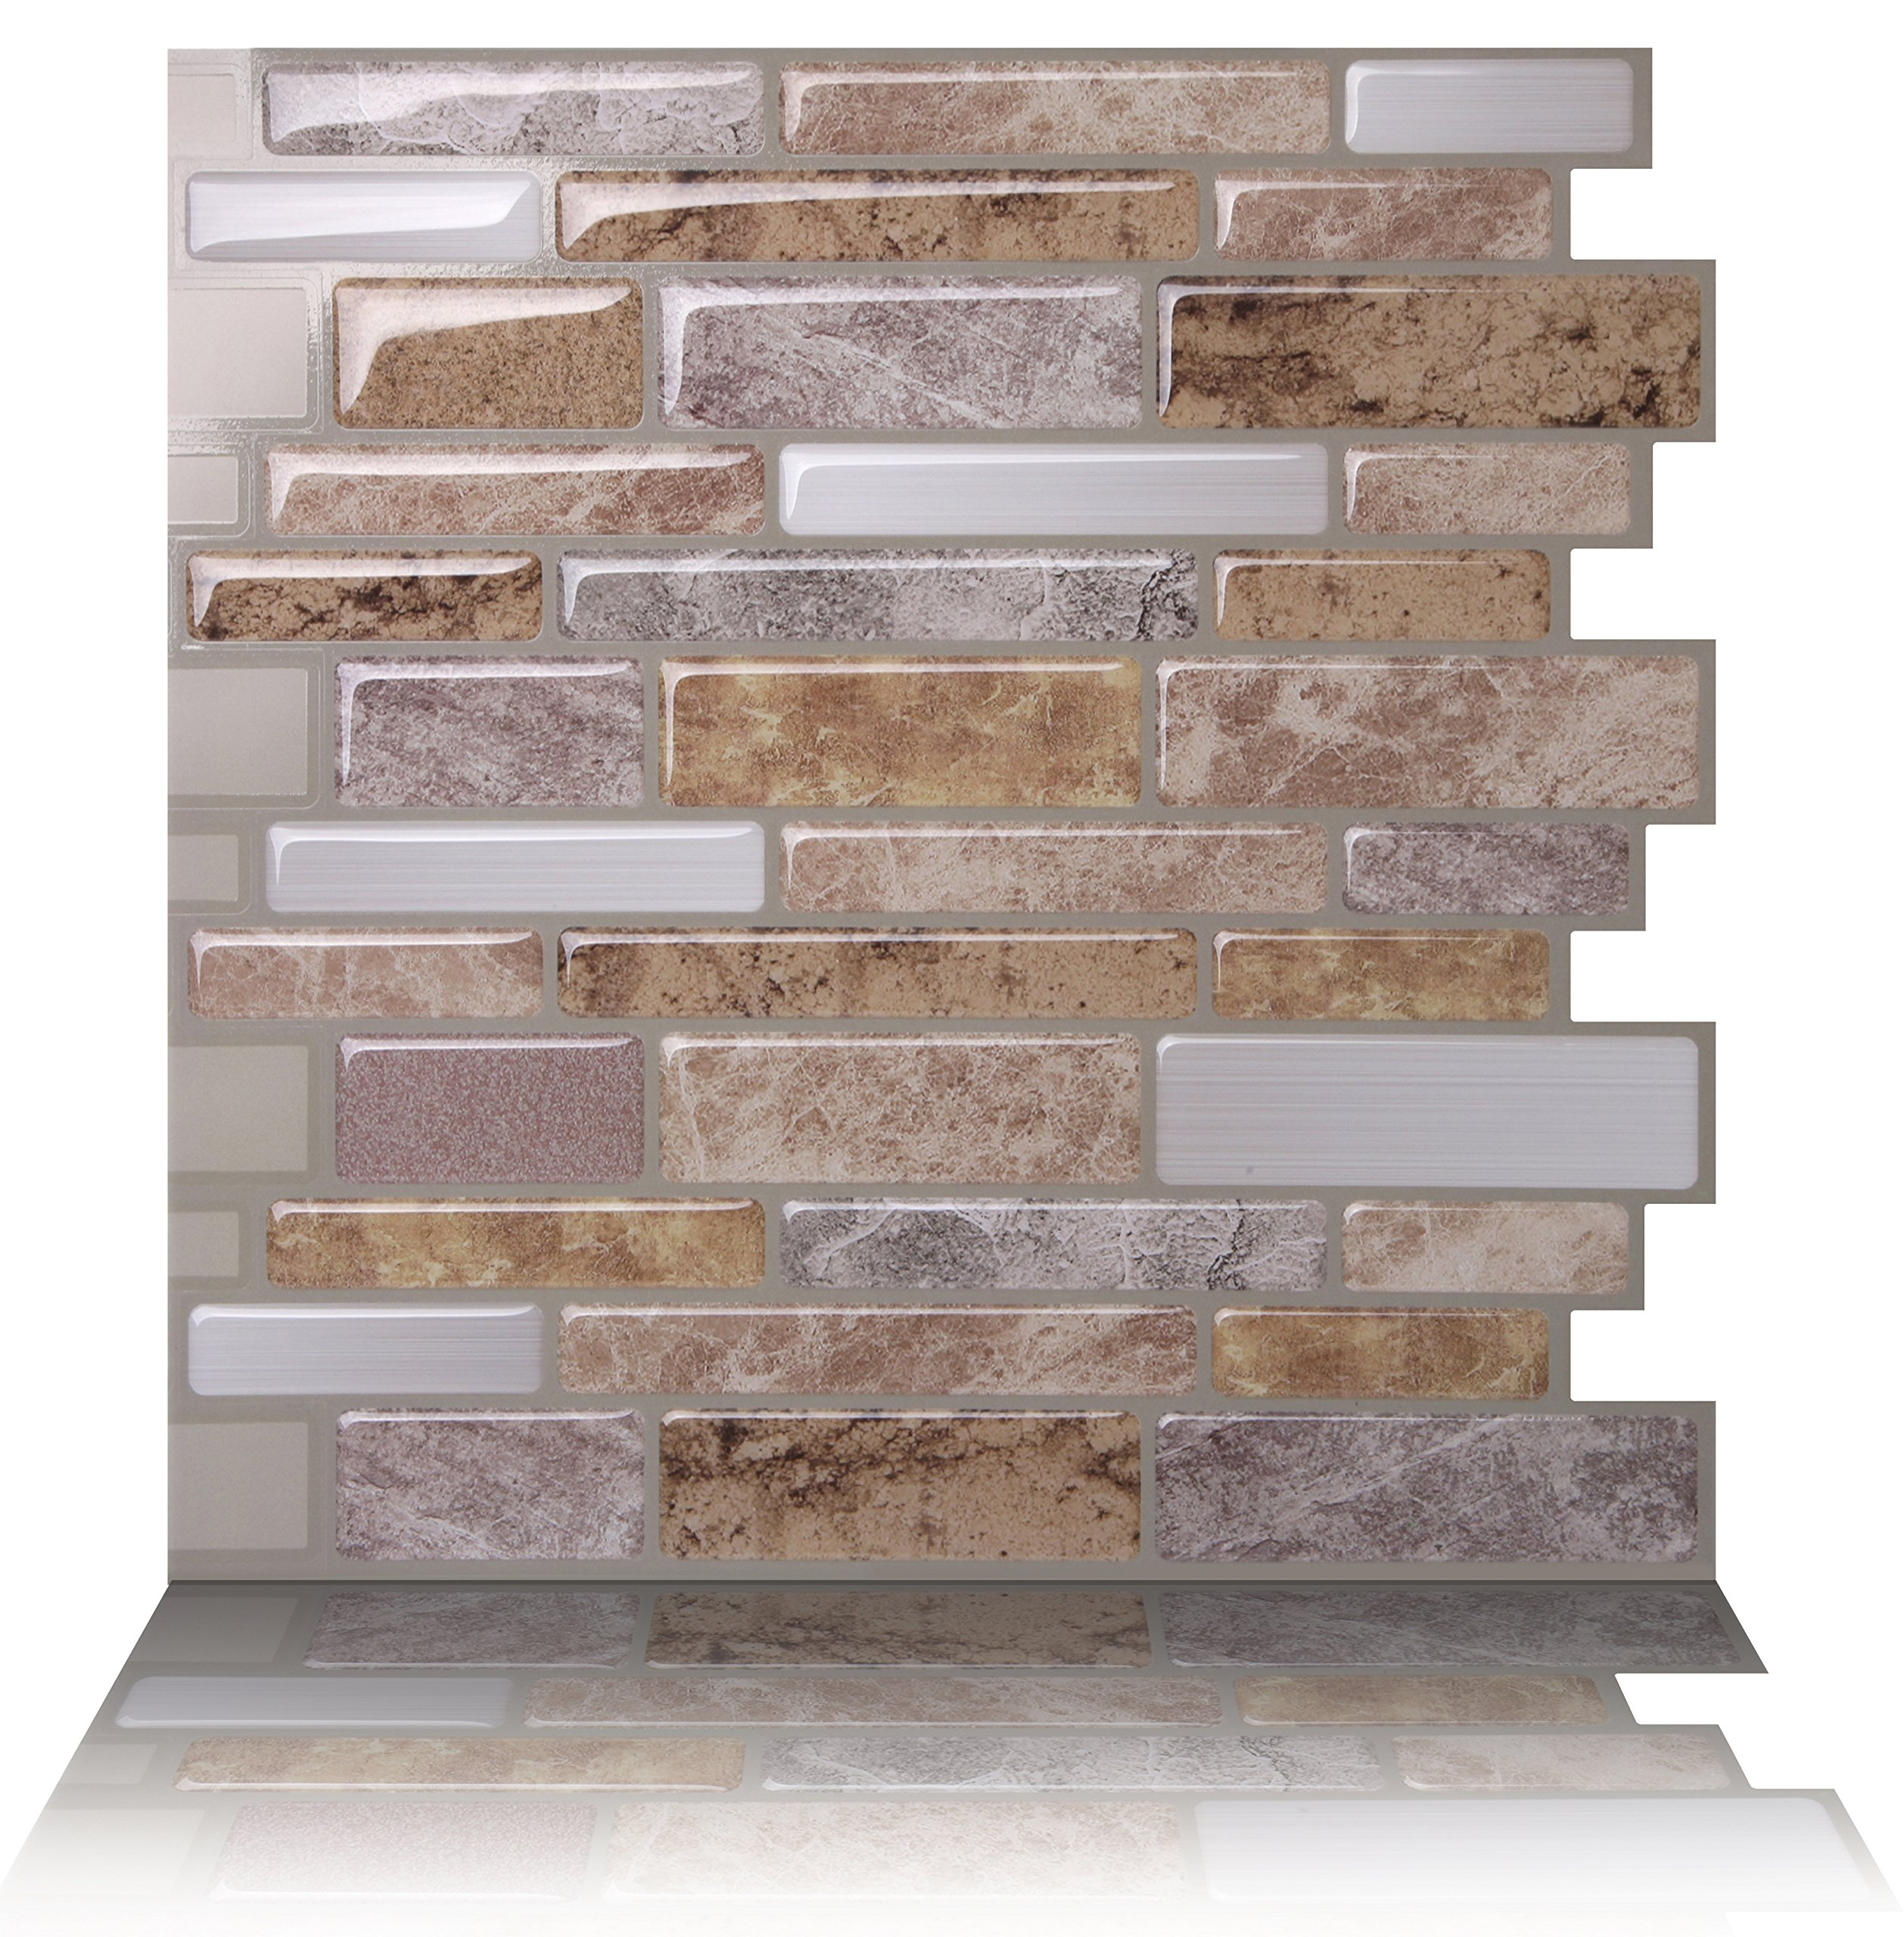 Tic Tac Tiles Anti-Mold Peel and Stick Wall Tile in Polito Fresco (10 Tiles)